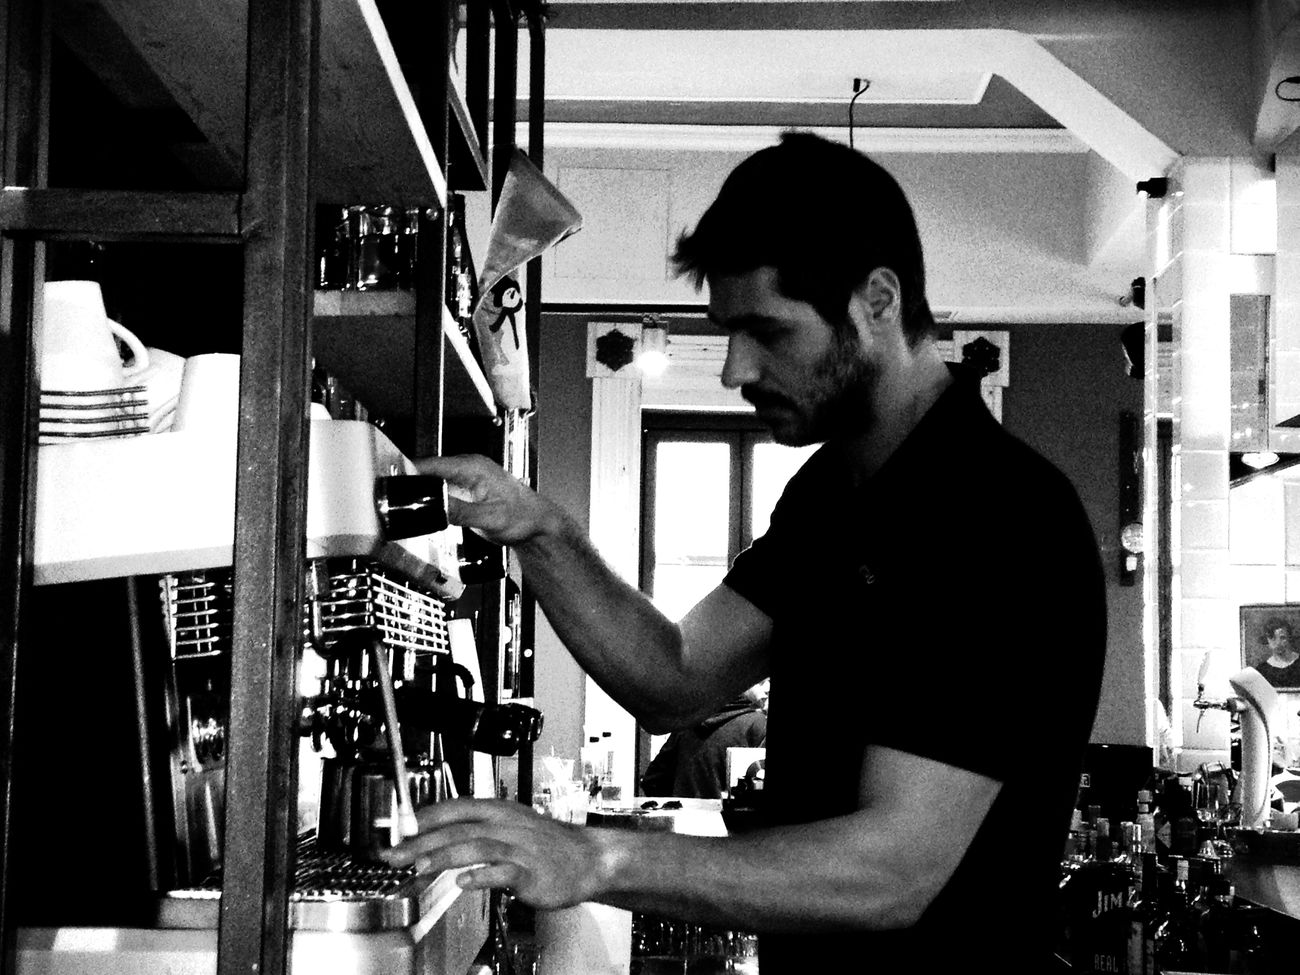 Coffee at Retro Coffee